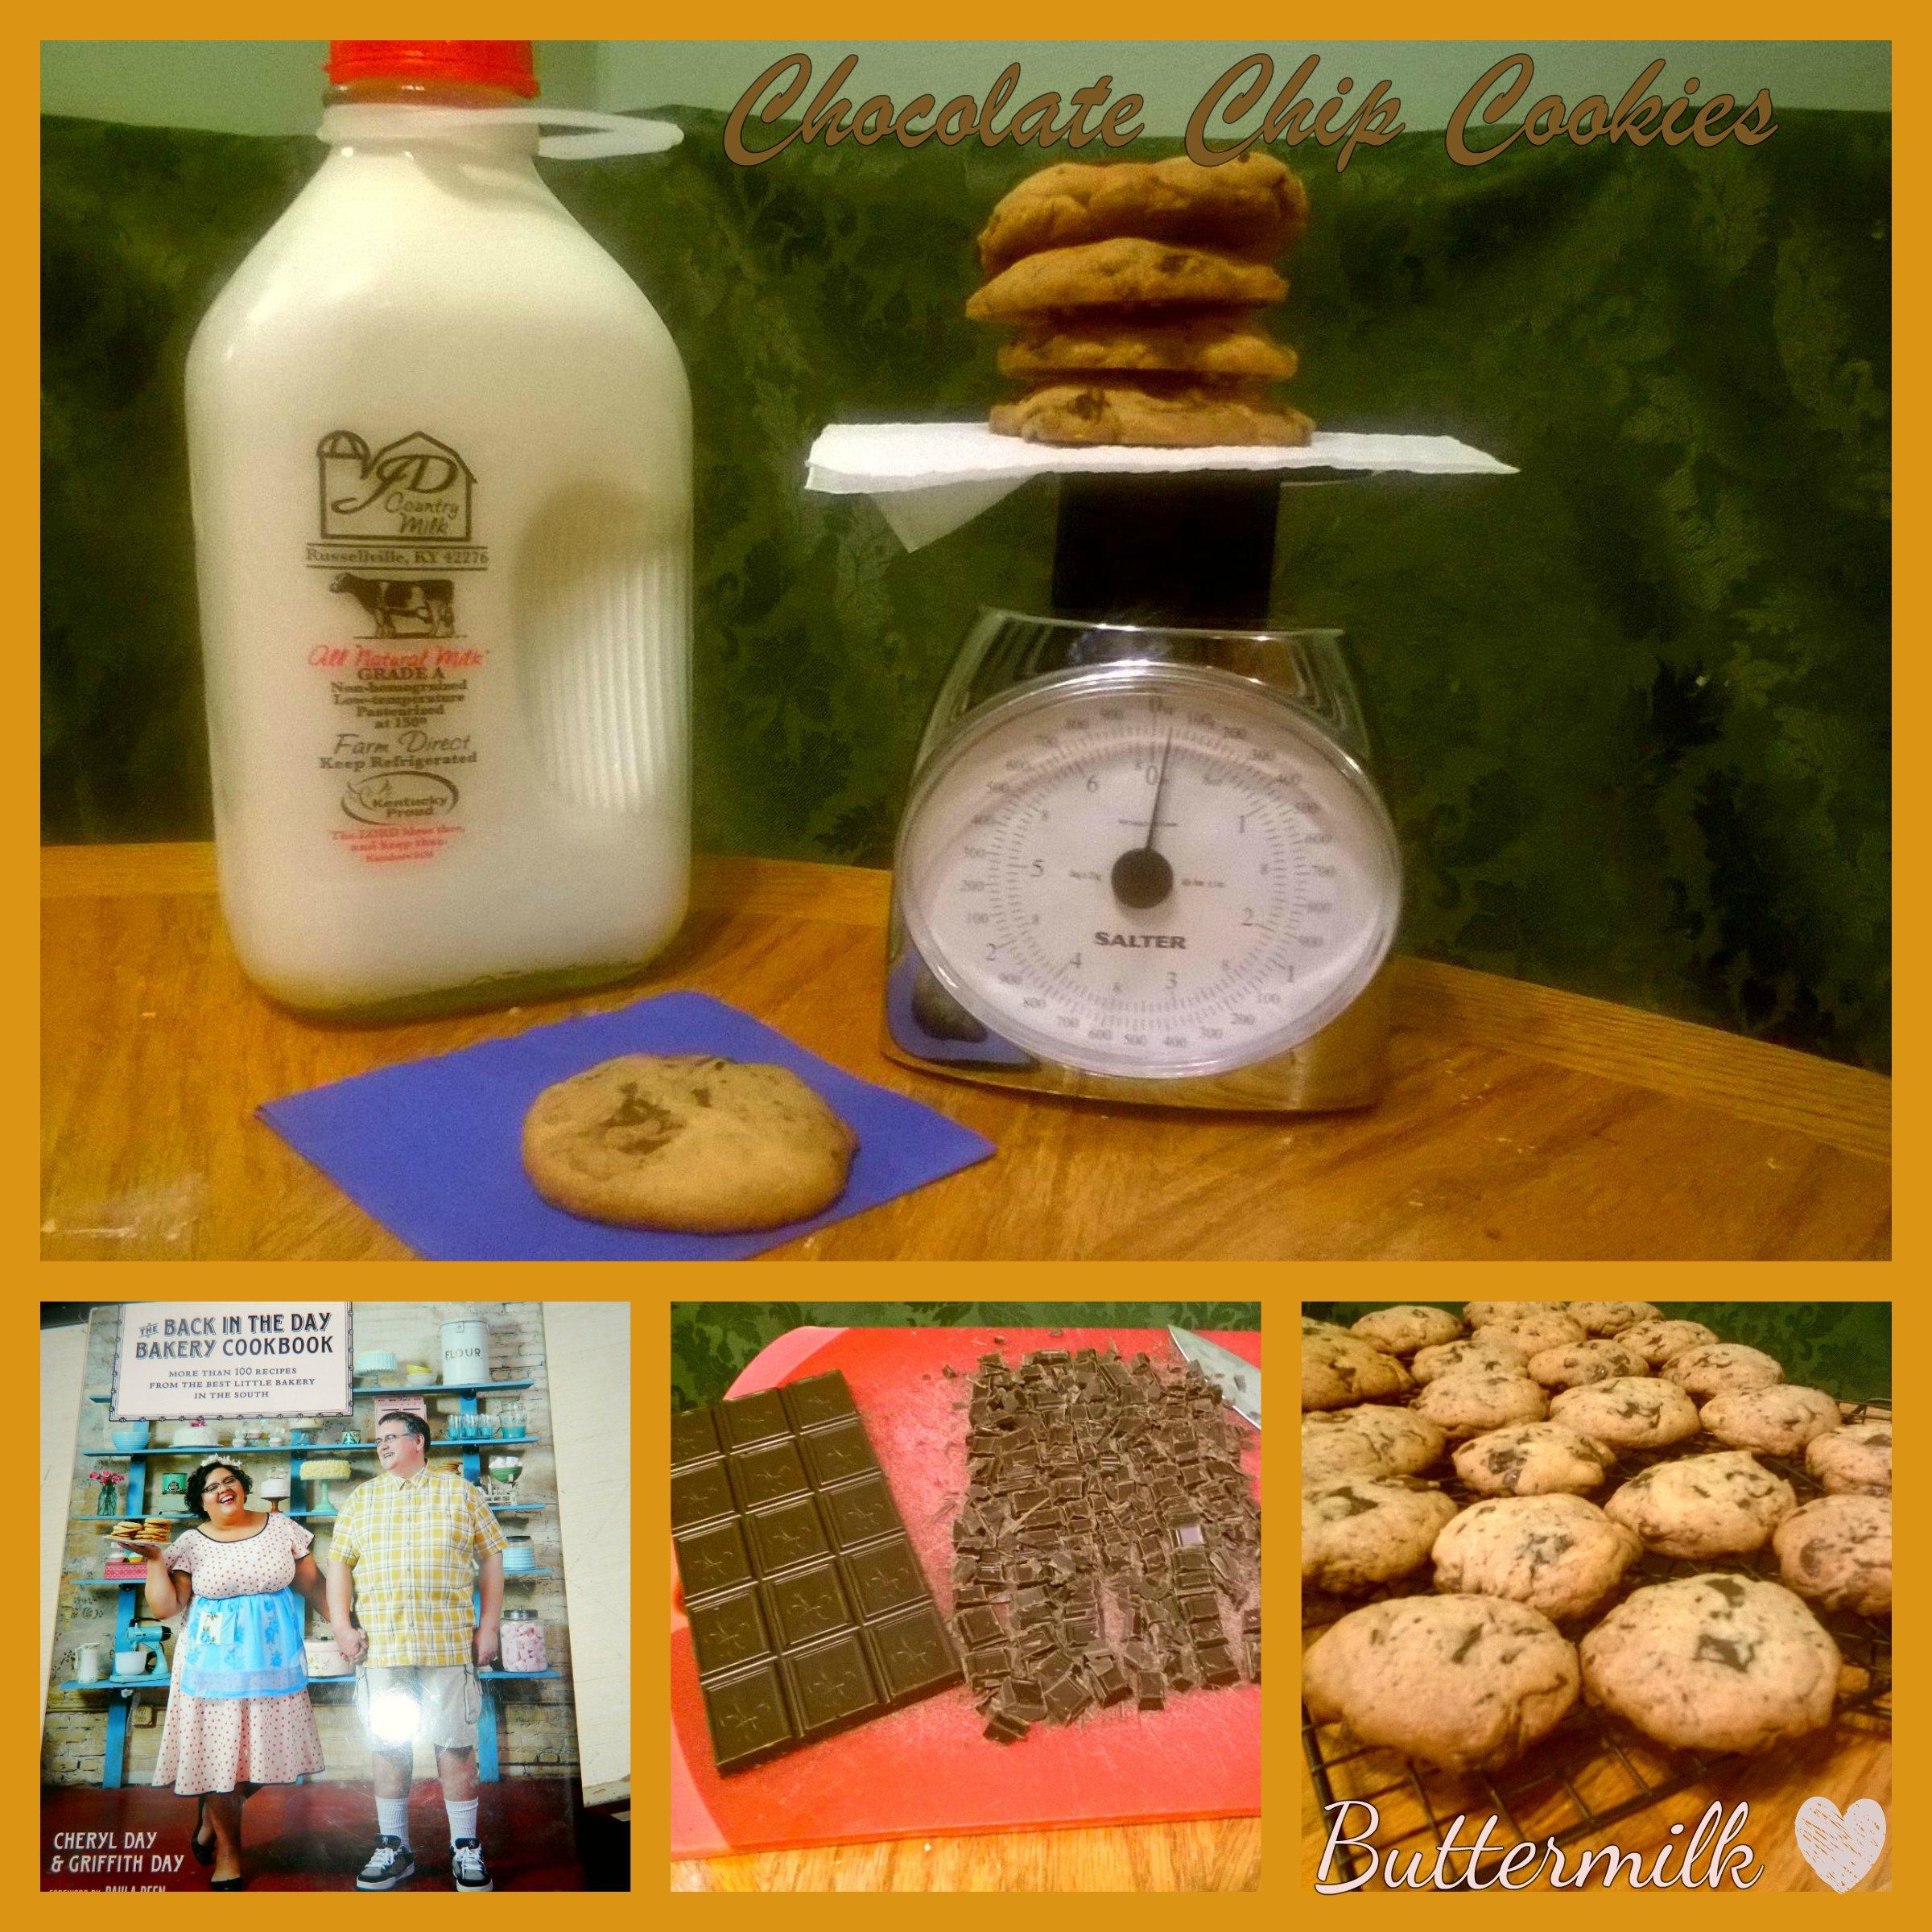 Chocolate Chip Cookies Buttermilk